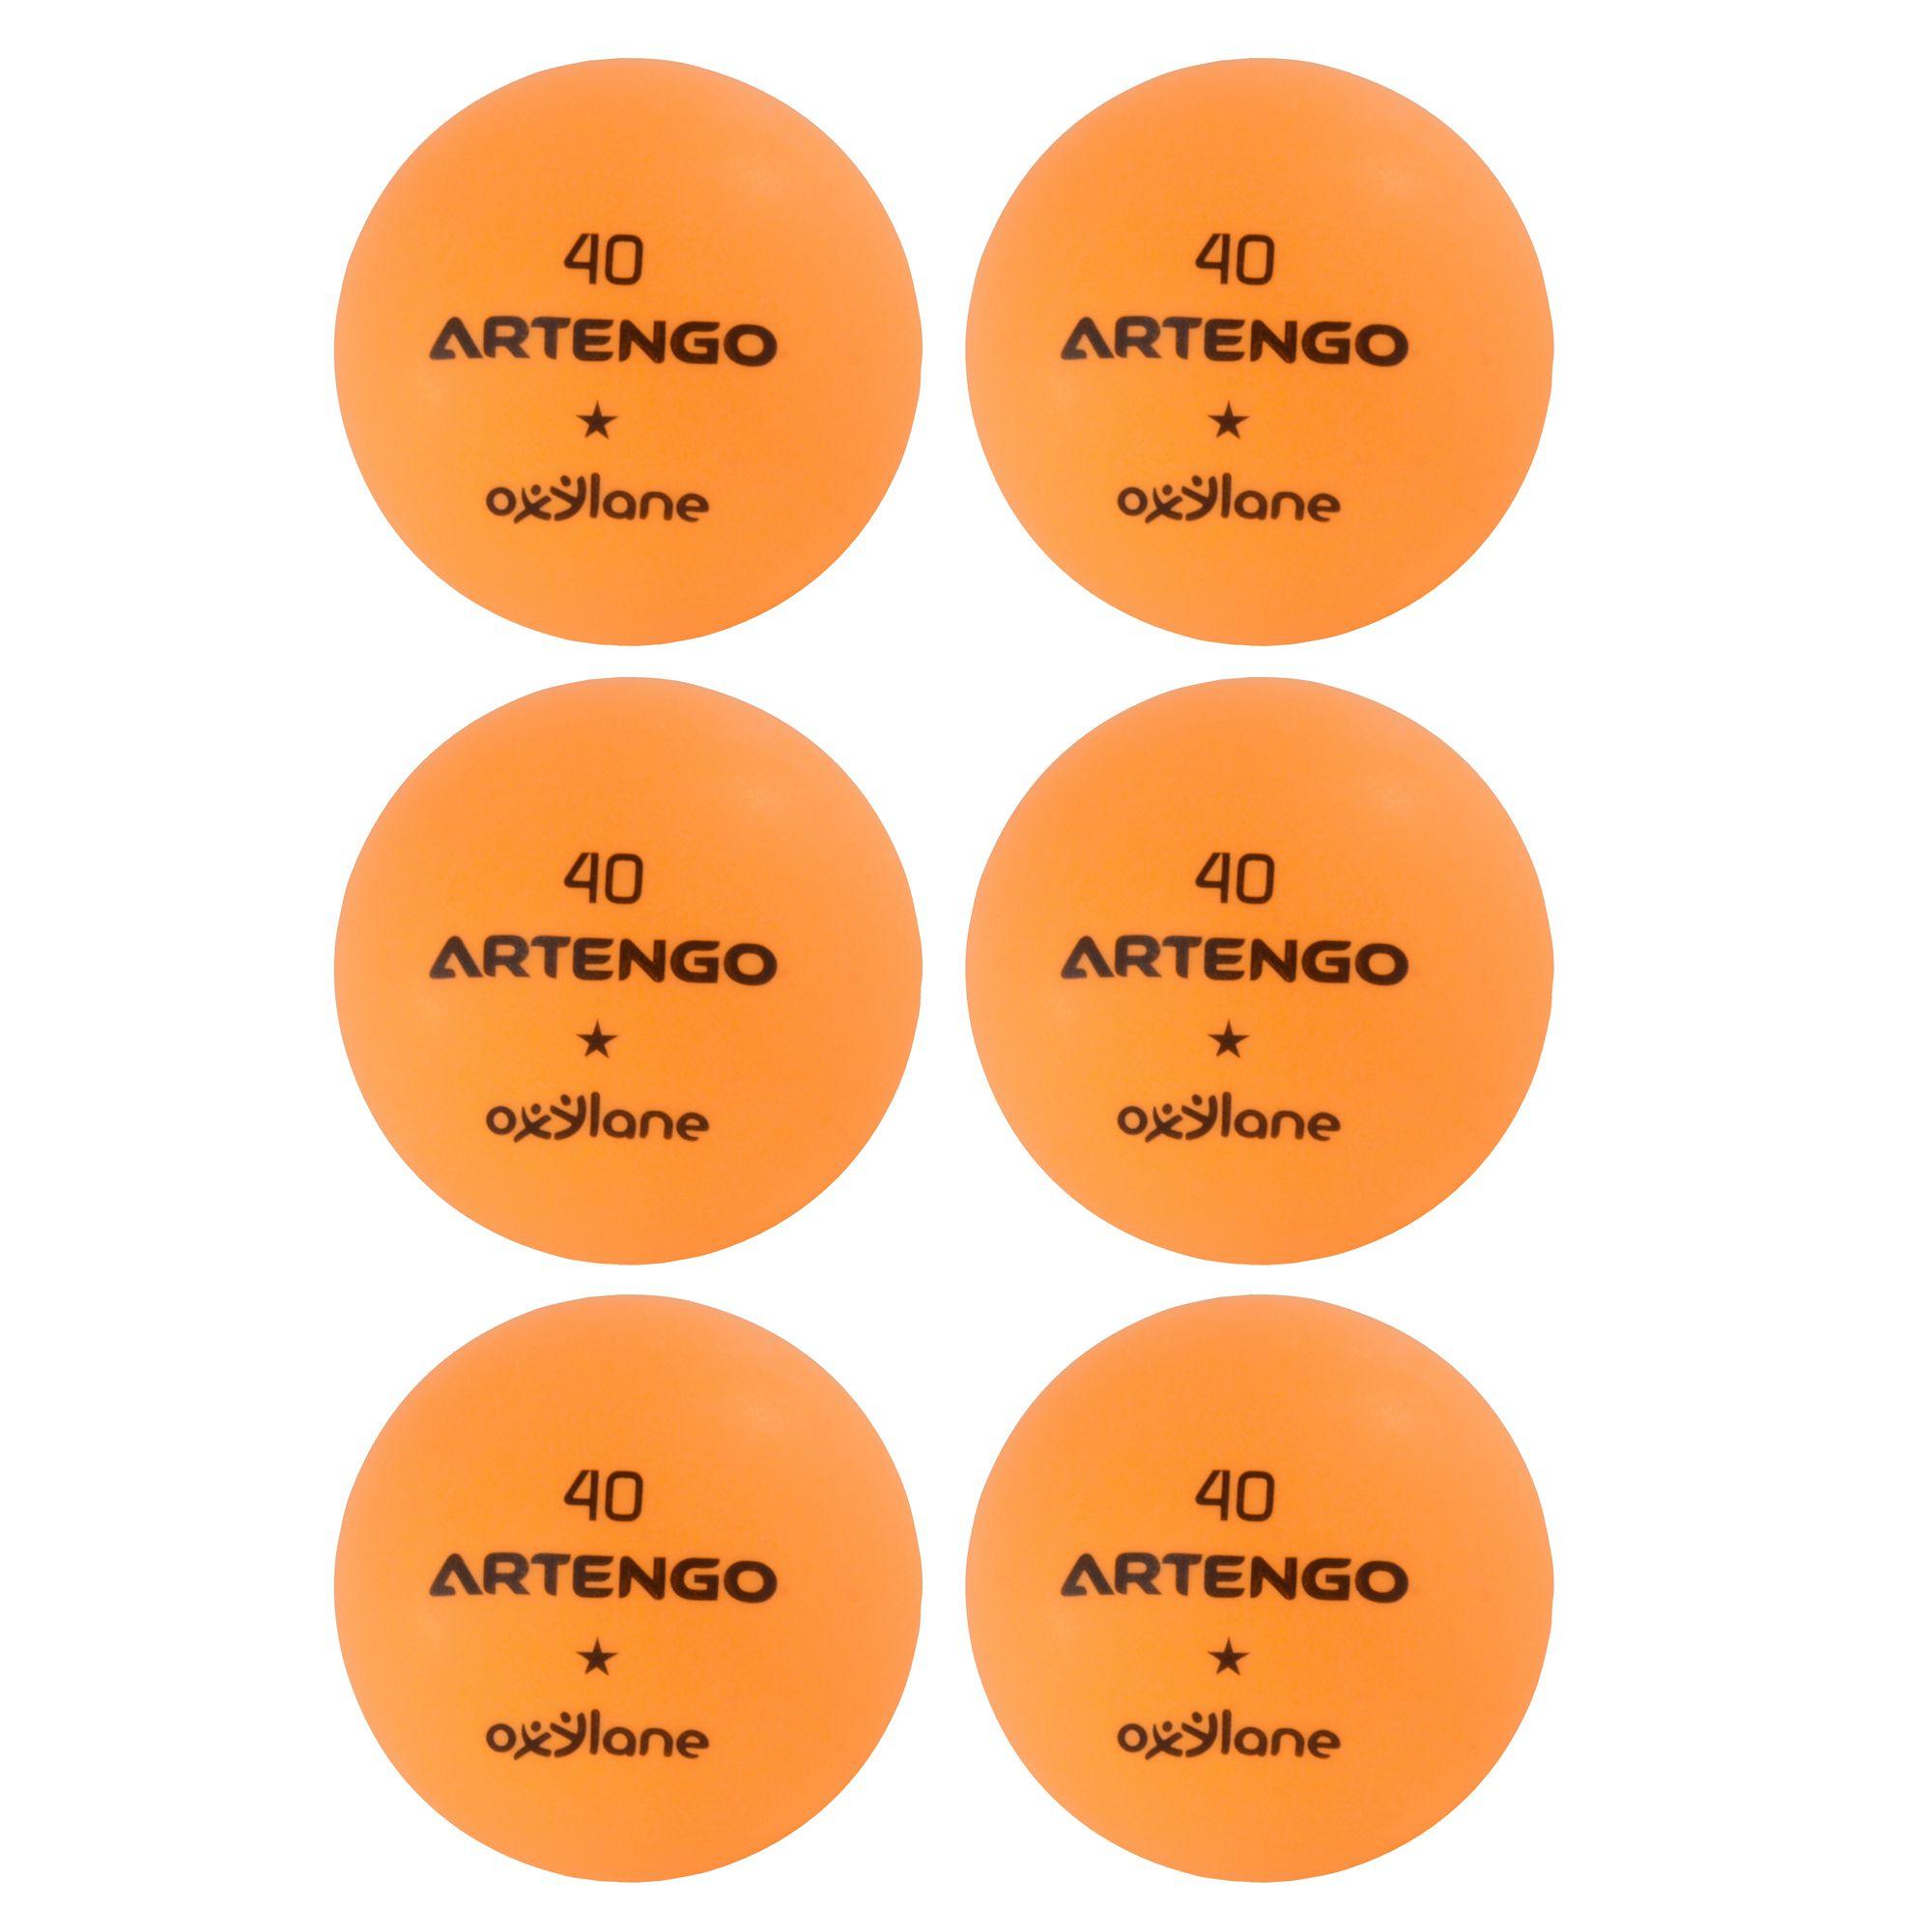 LOT DE 6 BALLES DE TENNIS DE TABLE FB 800 ORANGES ARTENGO